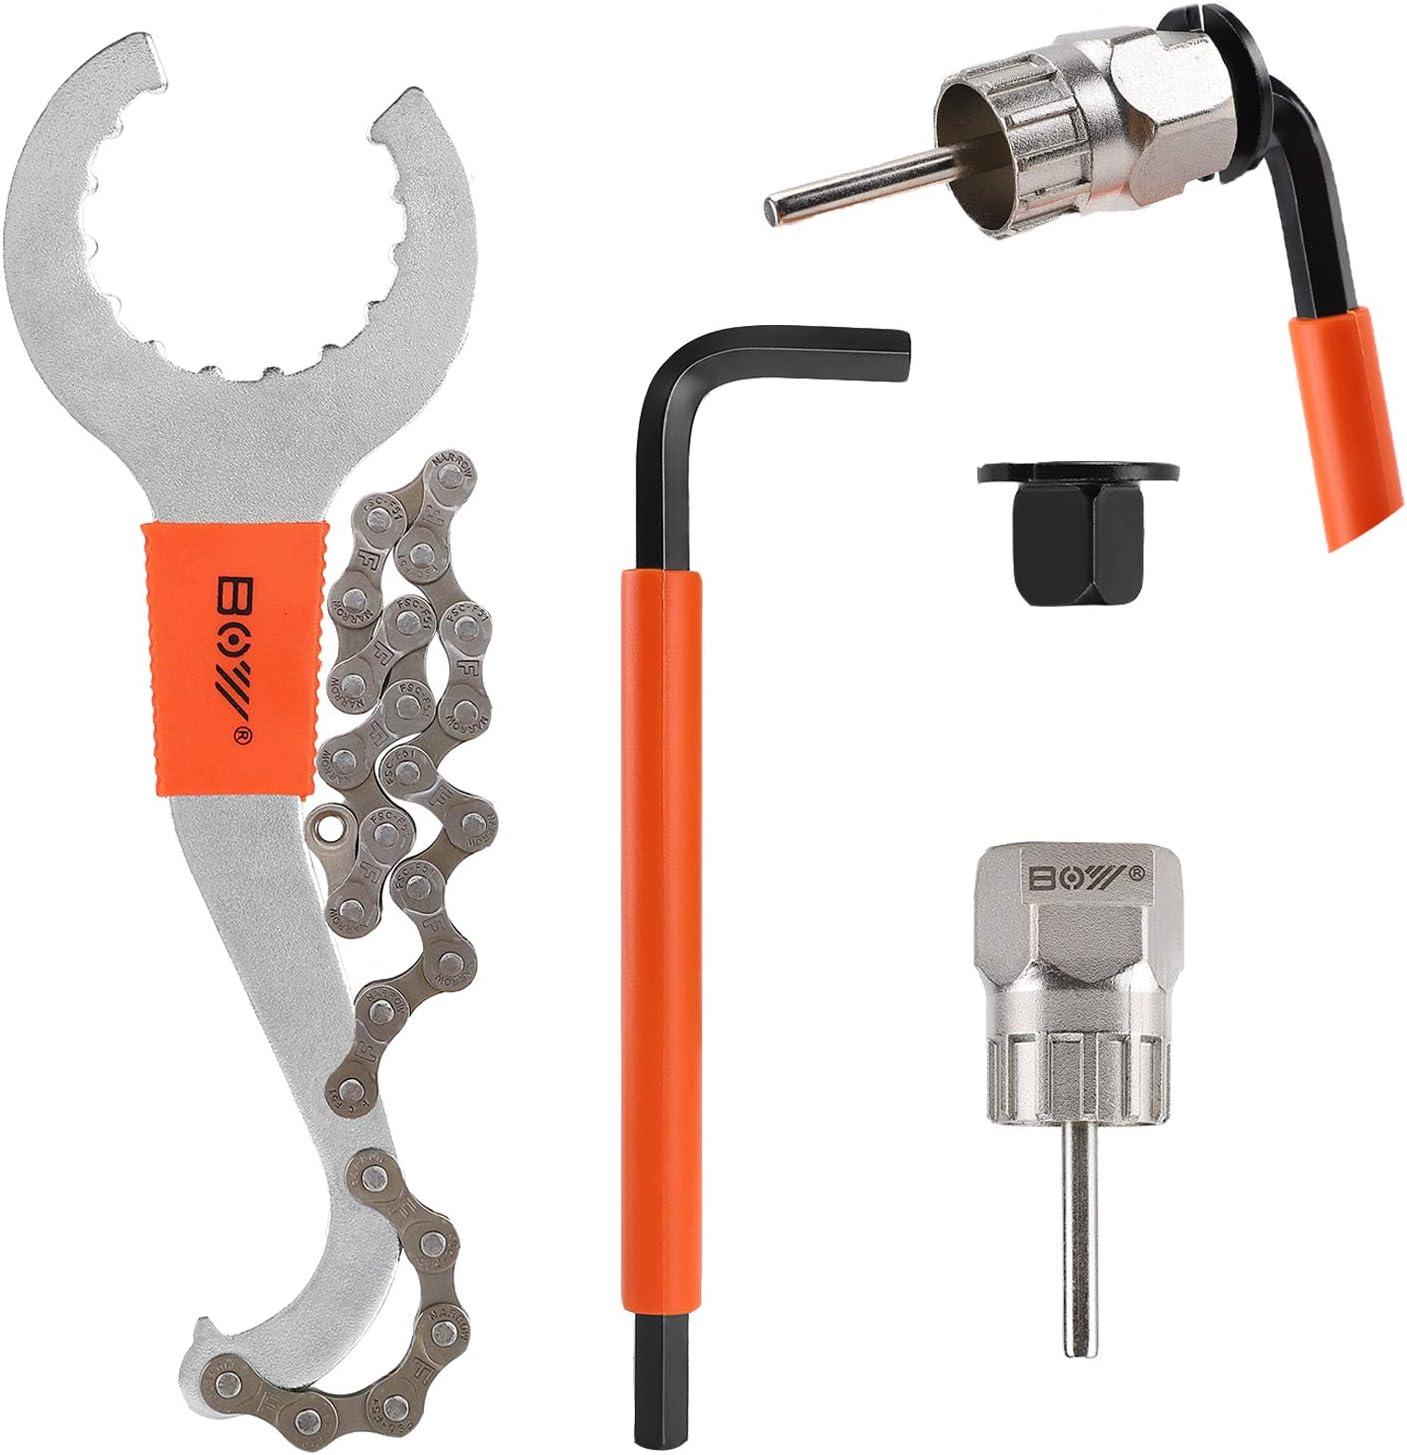 Bicycle Bike Cassette Freewheel Remover Chain Whip Sprocket Lock Repair Tool Kit